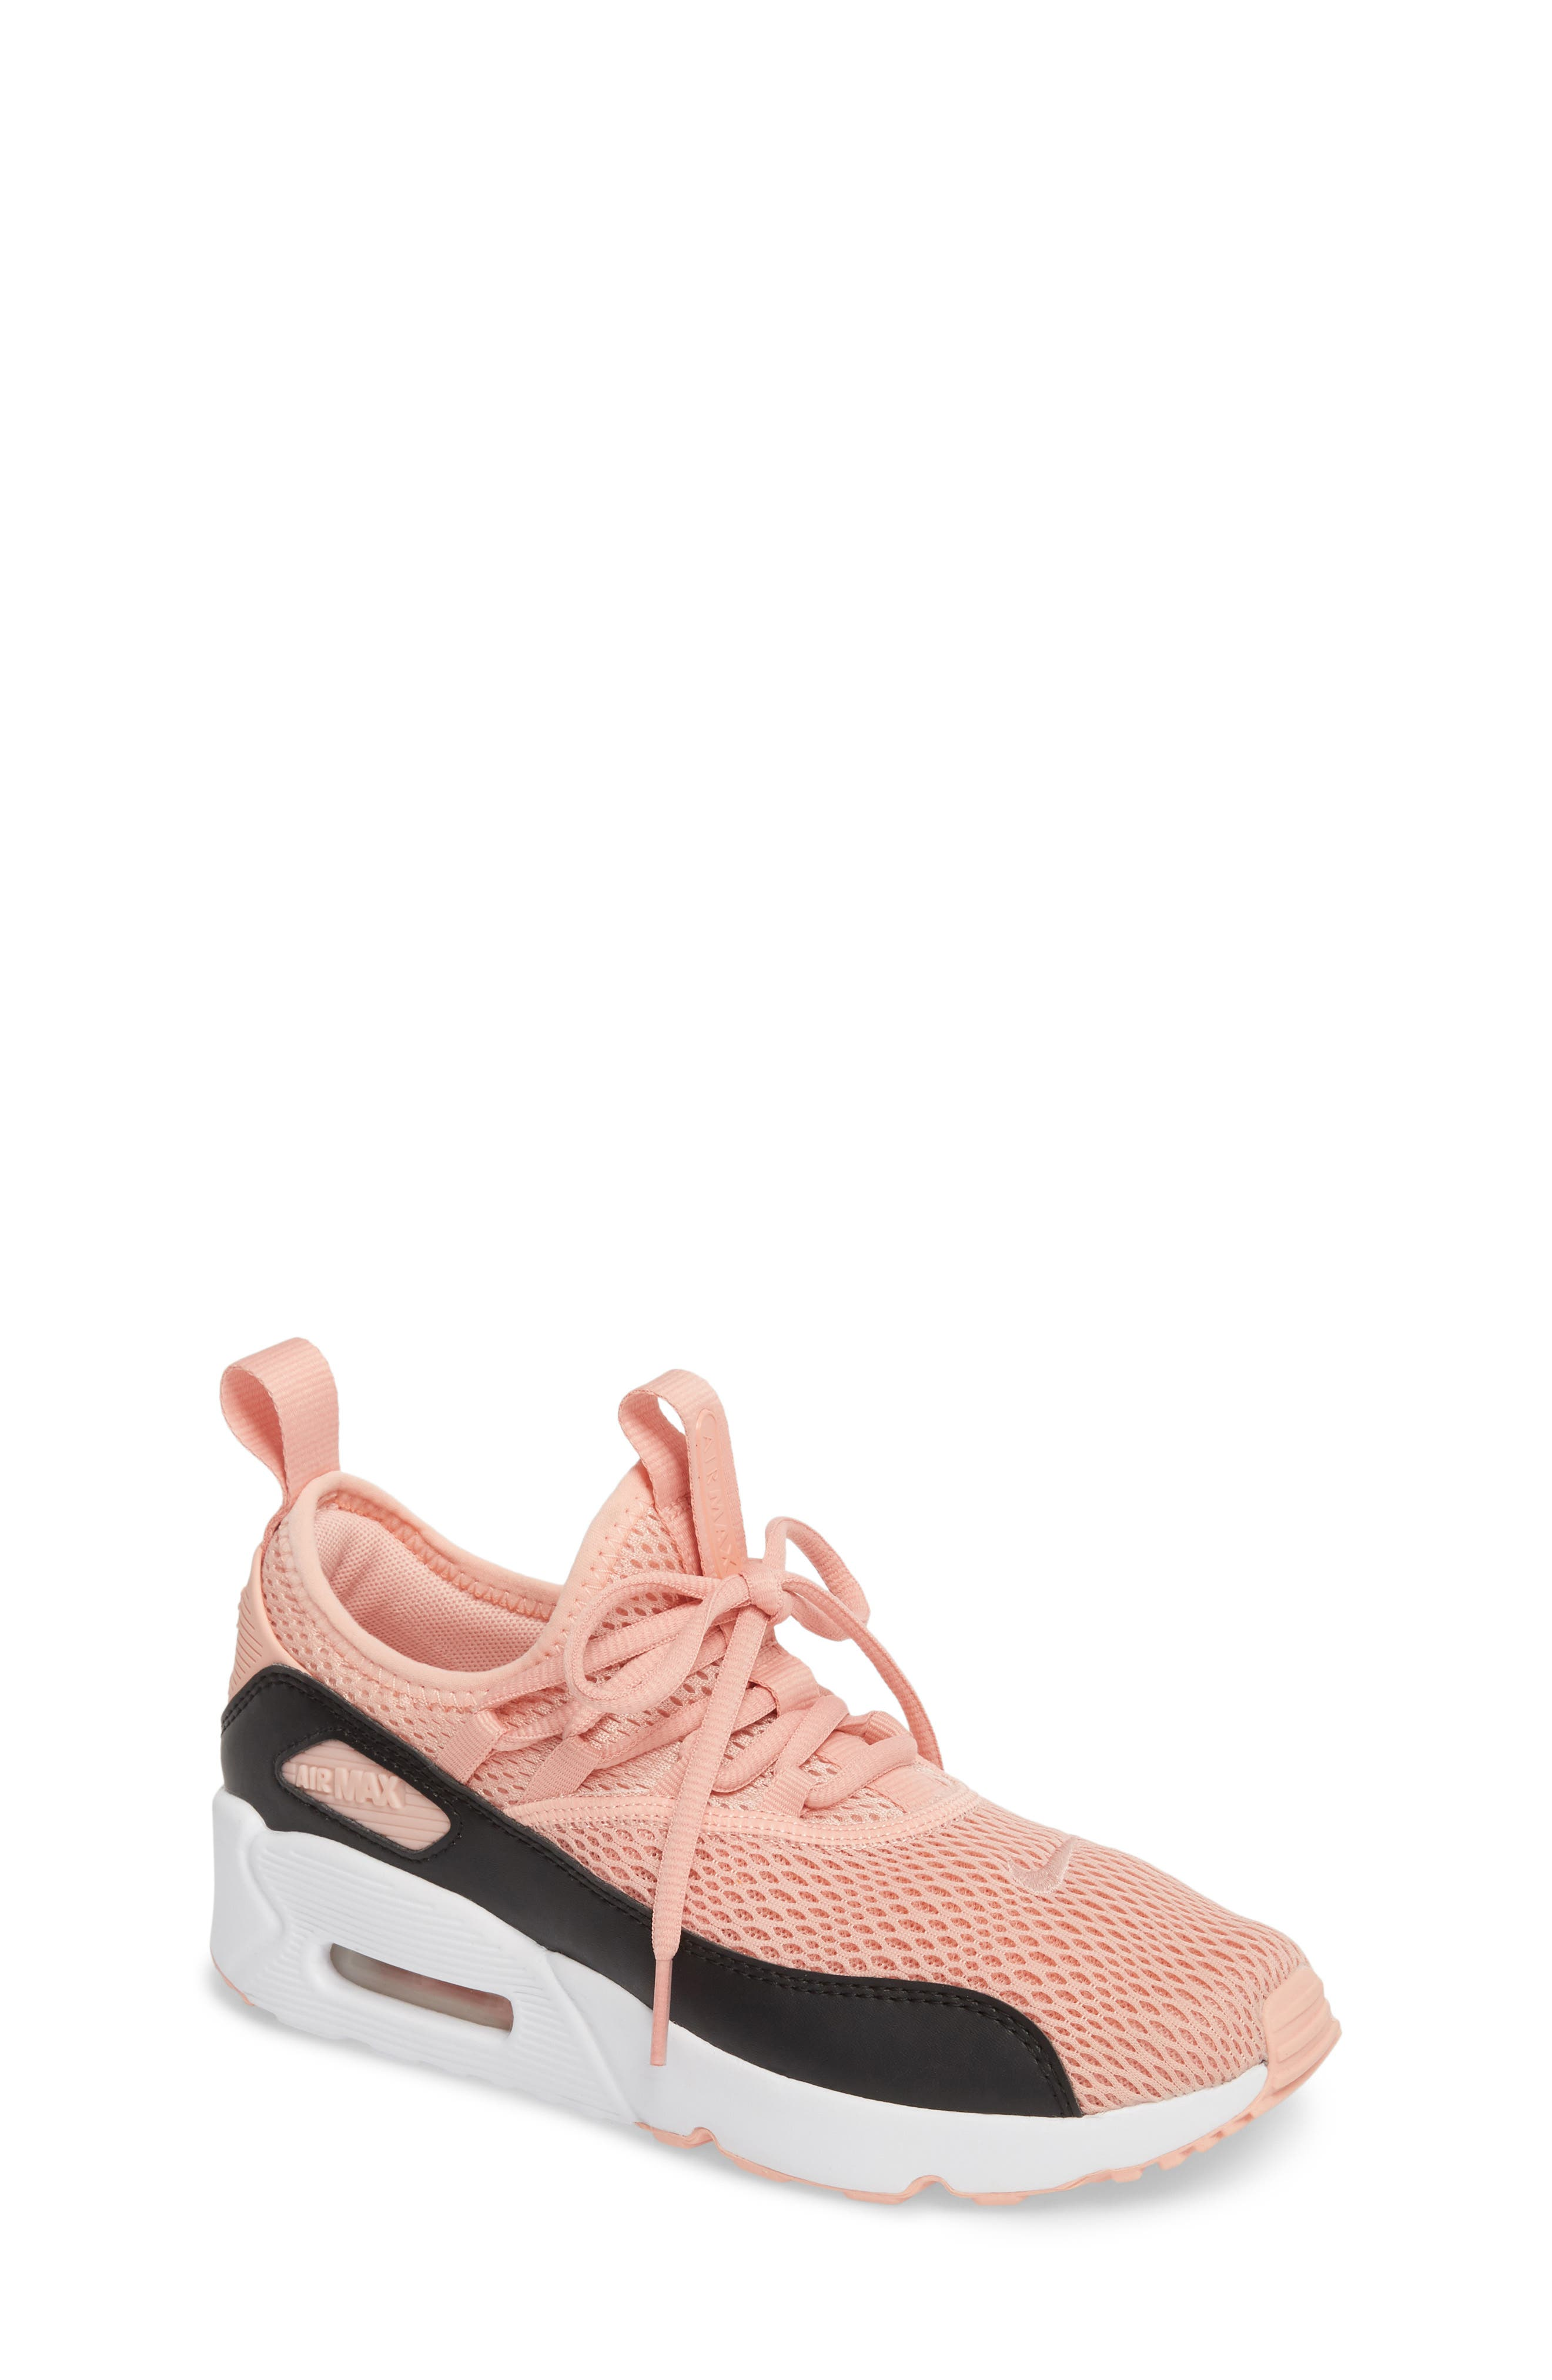 Air Max 90 EZ Sneaker,                             Main thumbnail 1, color,                             Coral Stardust/ Black